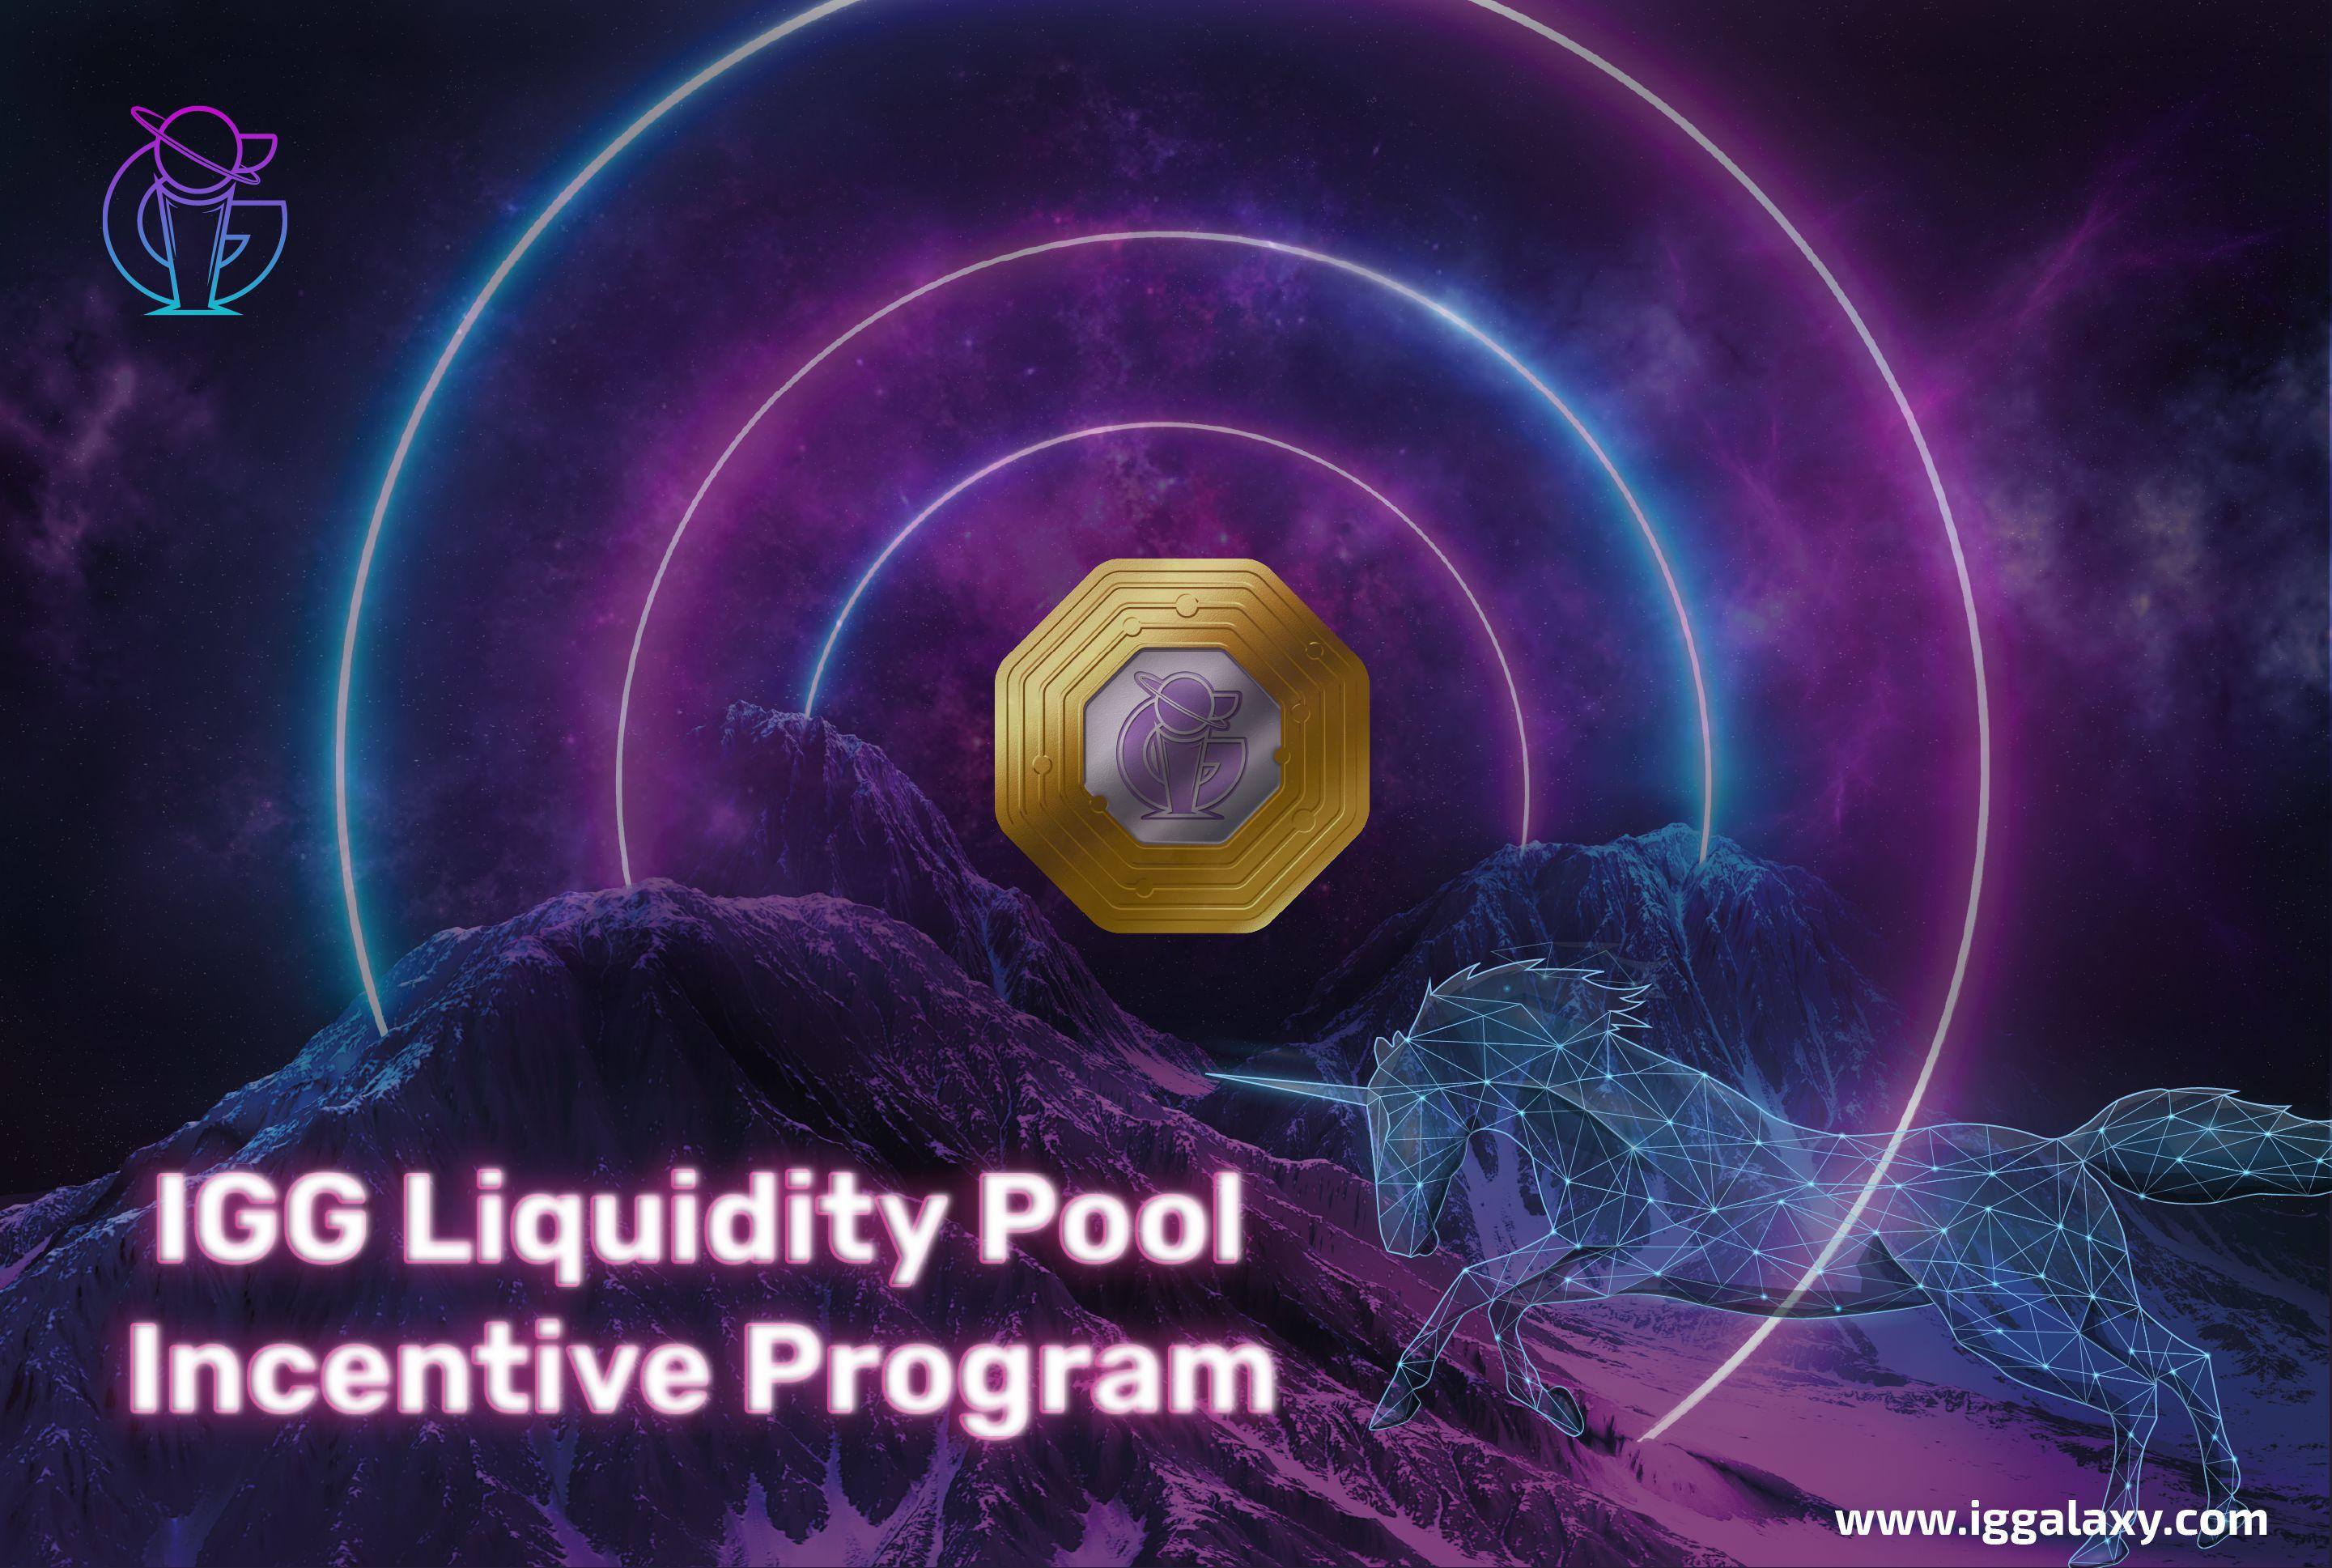 IGGalaxy's Liquidity Pool Incentive Program: Launching with UniSwap Protocol!